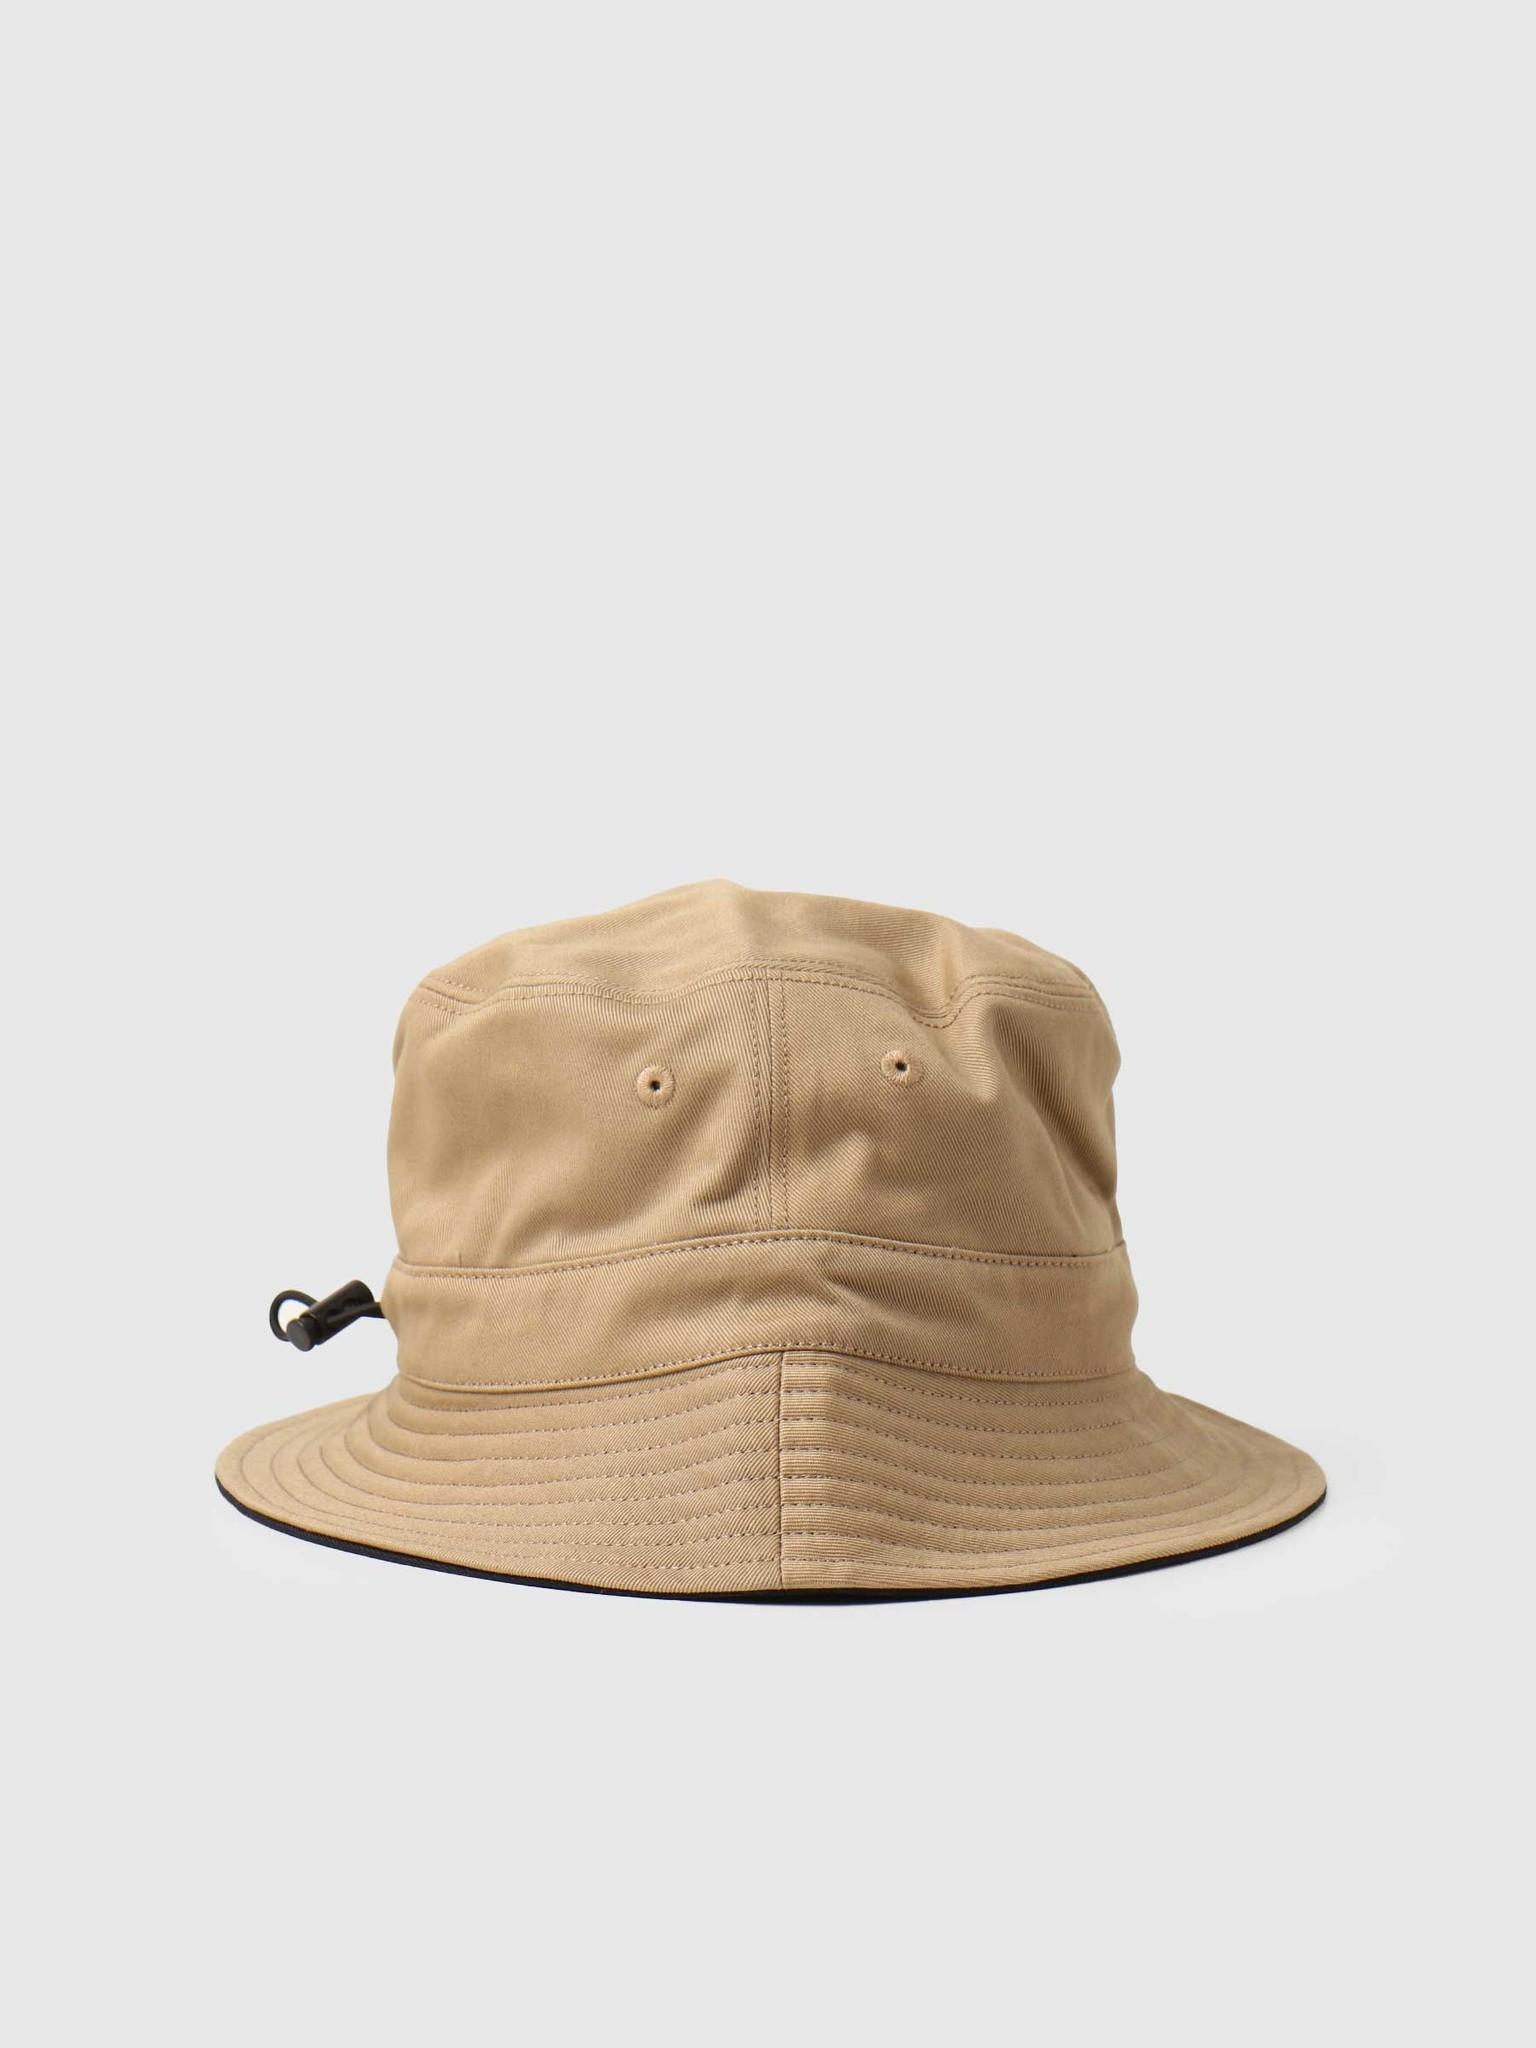 Gramicci Gramicci Reversible Hat Chino X Double Navy GAC-21S073